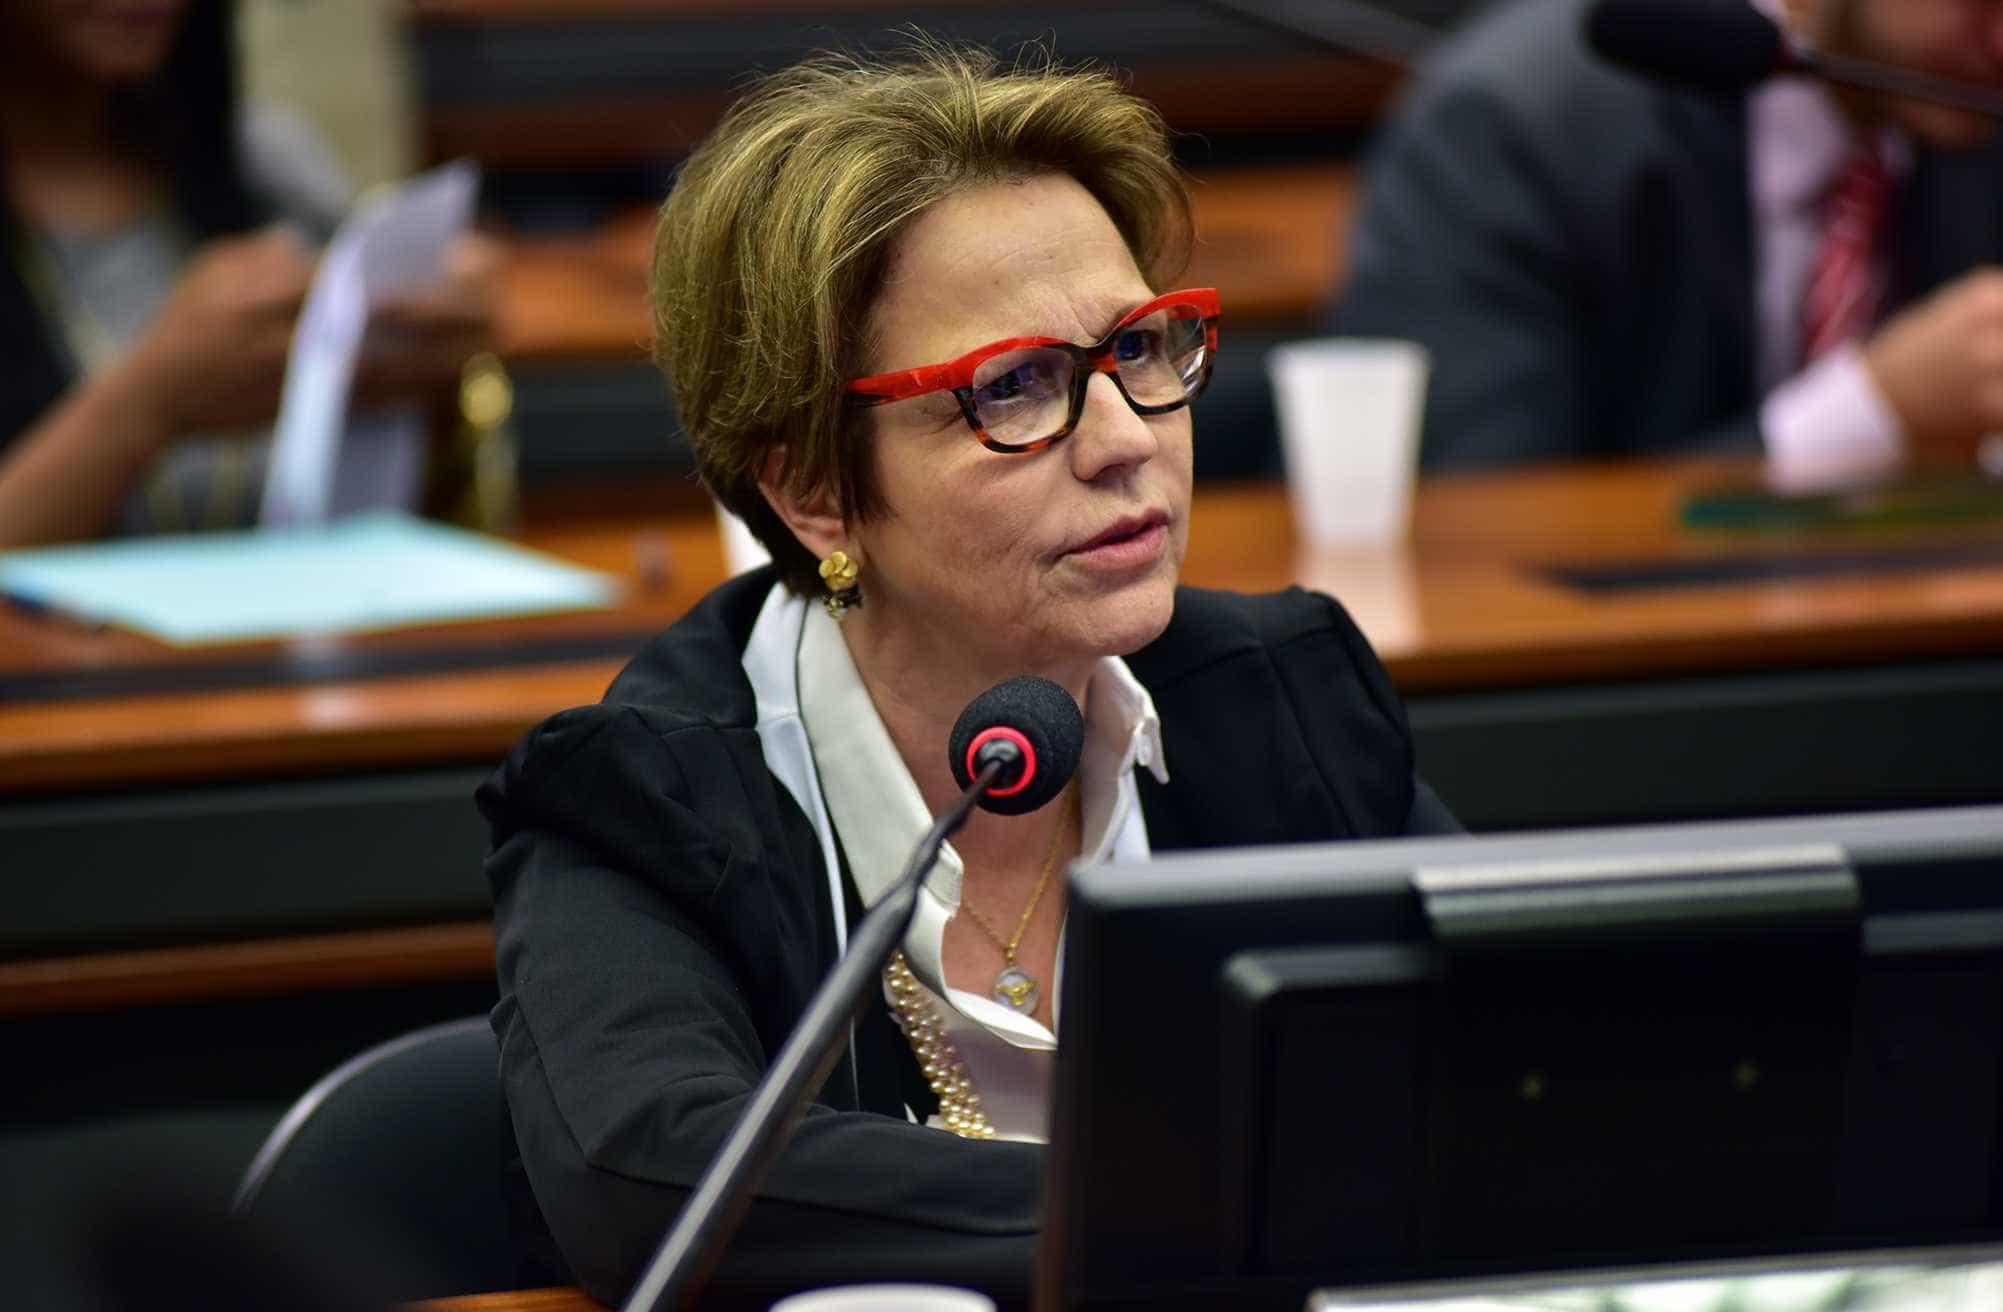 Futura ministra da Agricultura quer bônus para ruralista cumprir lei